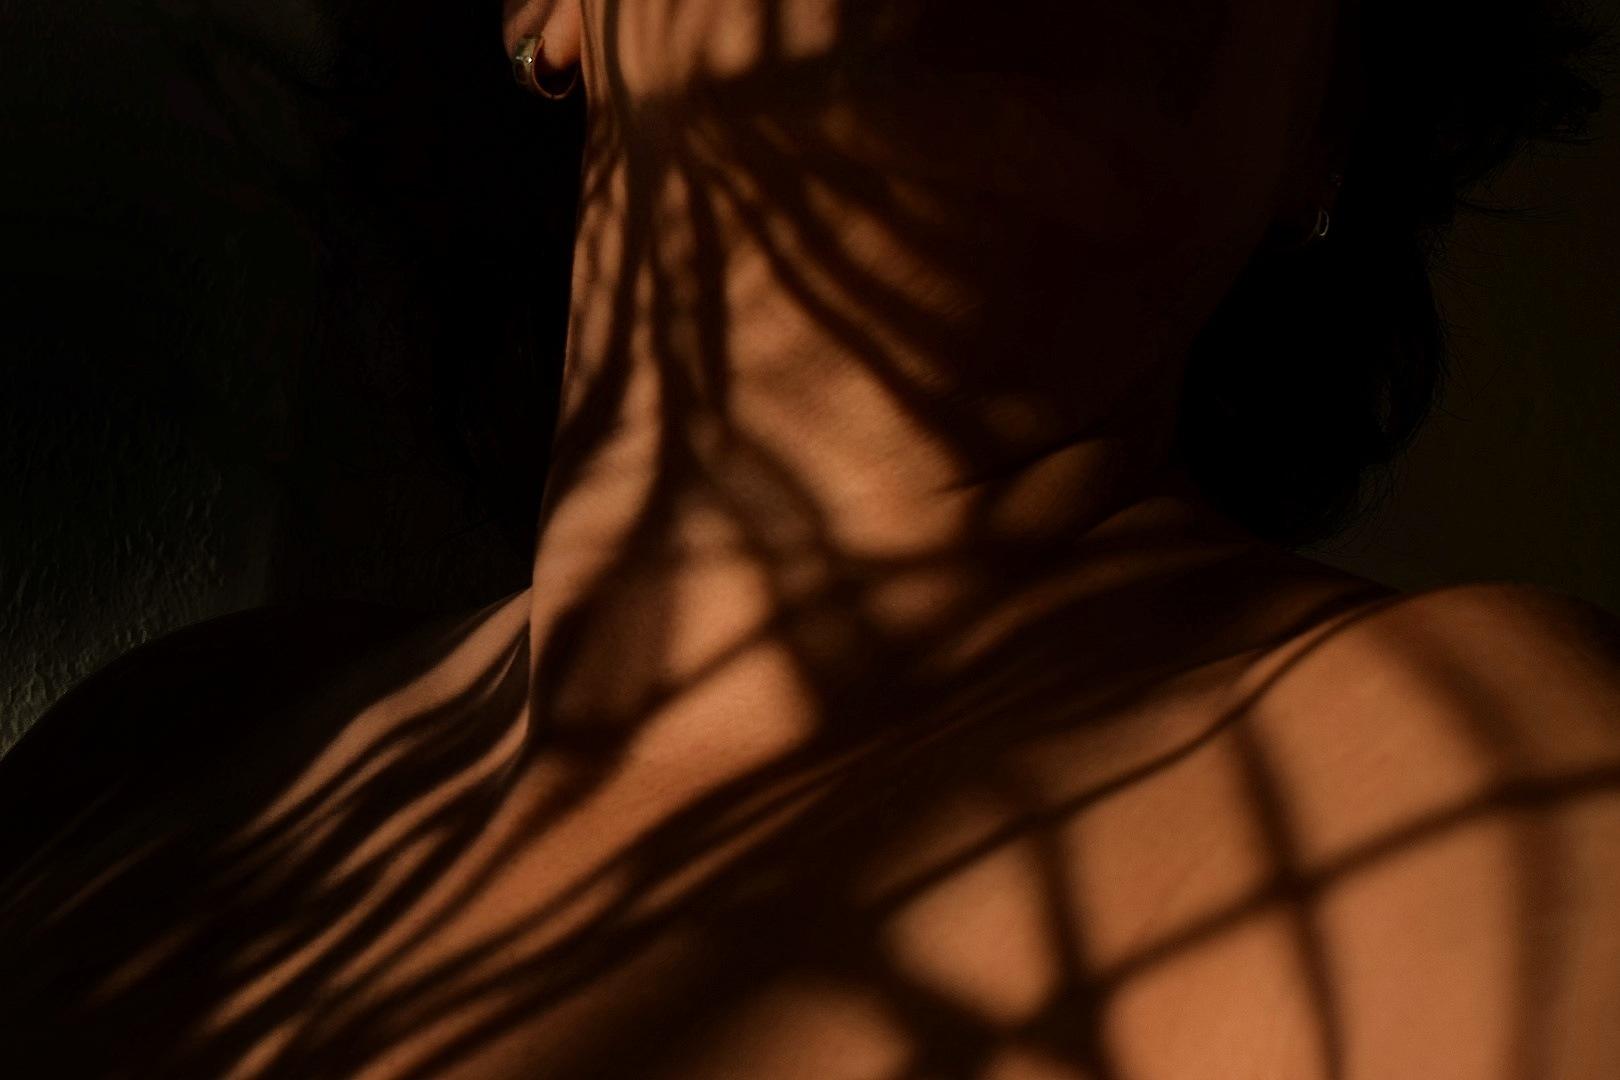 Shadow by Simone